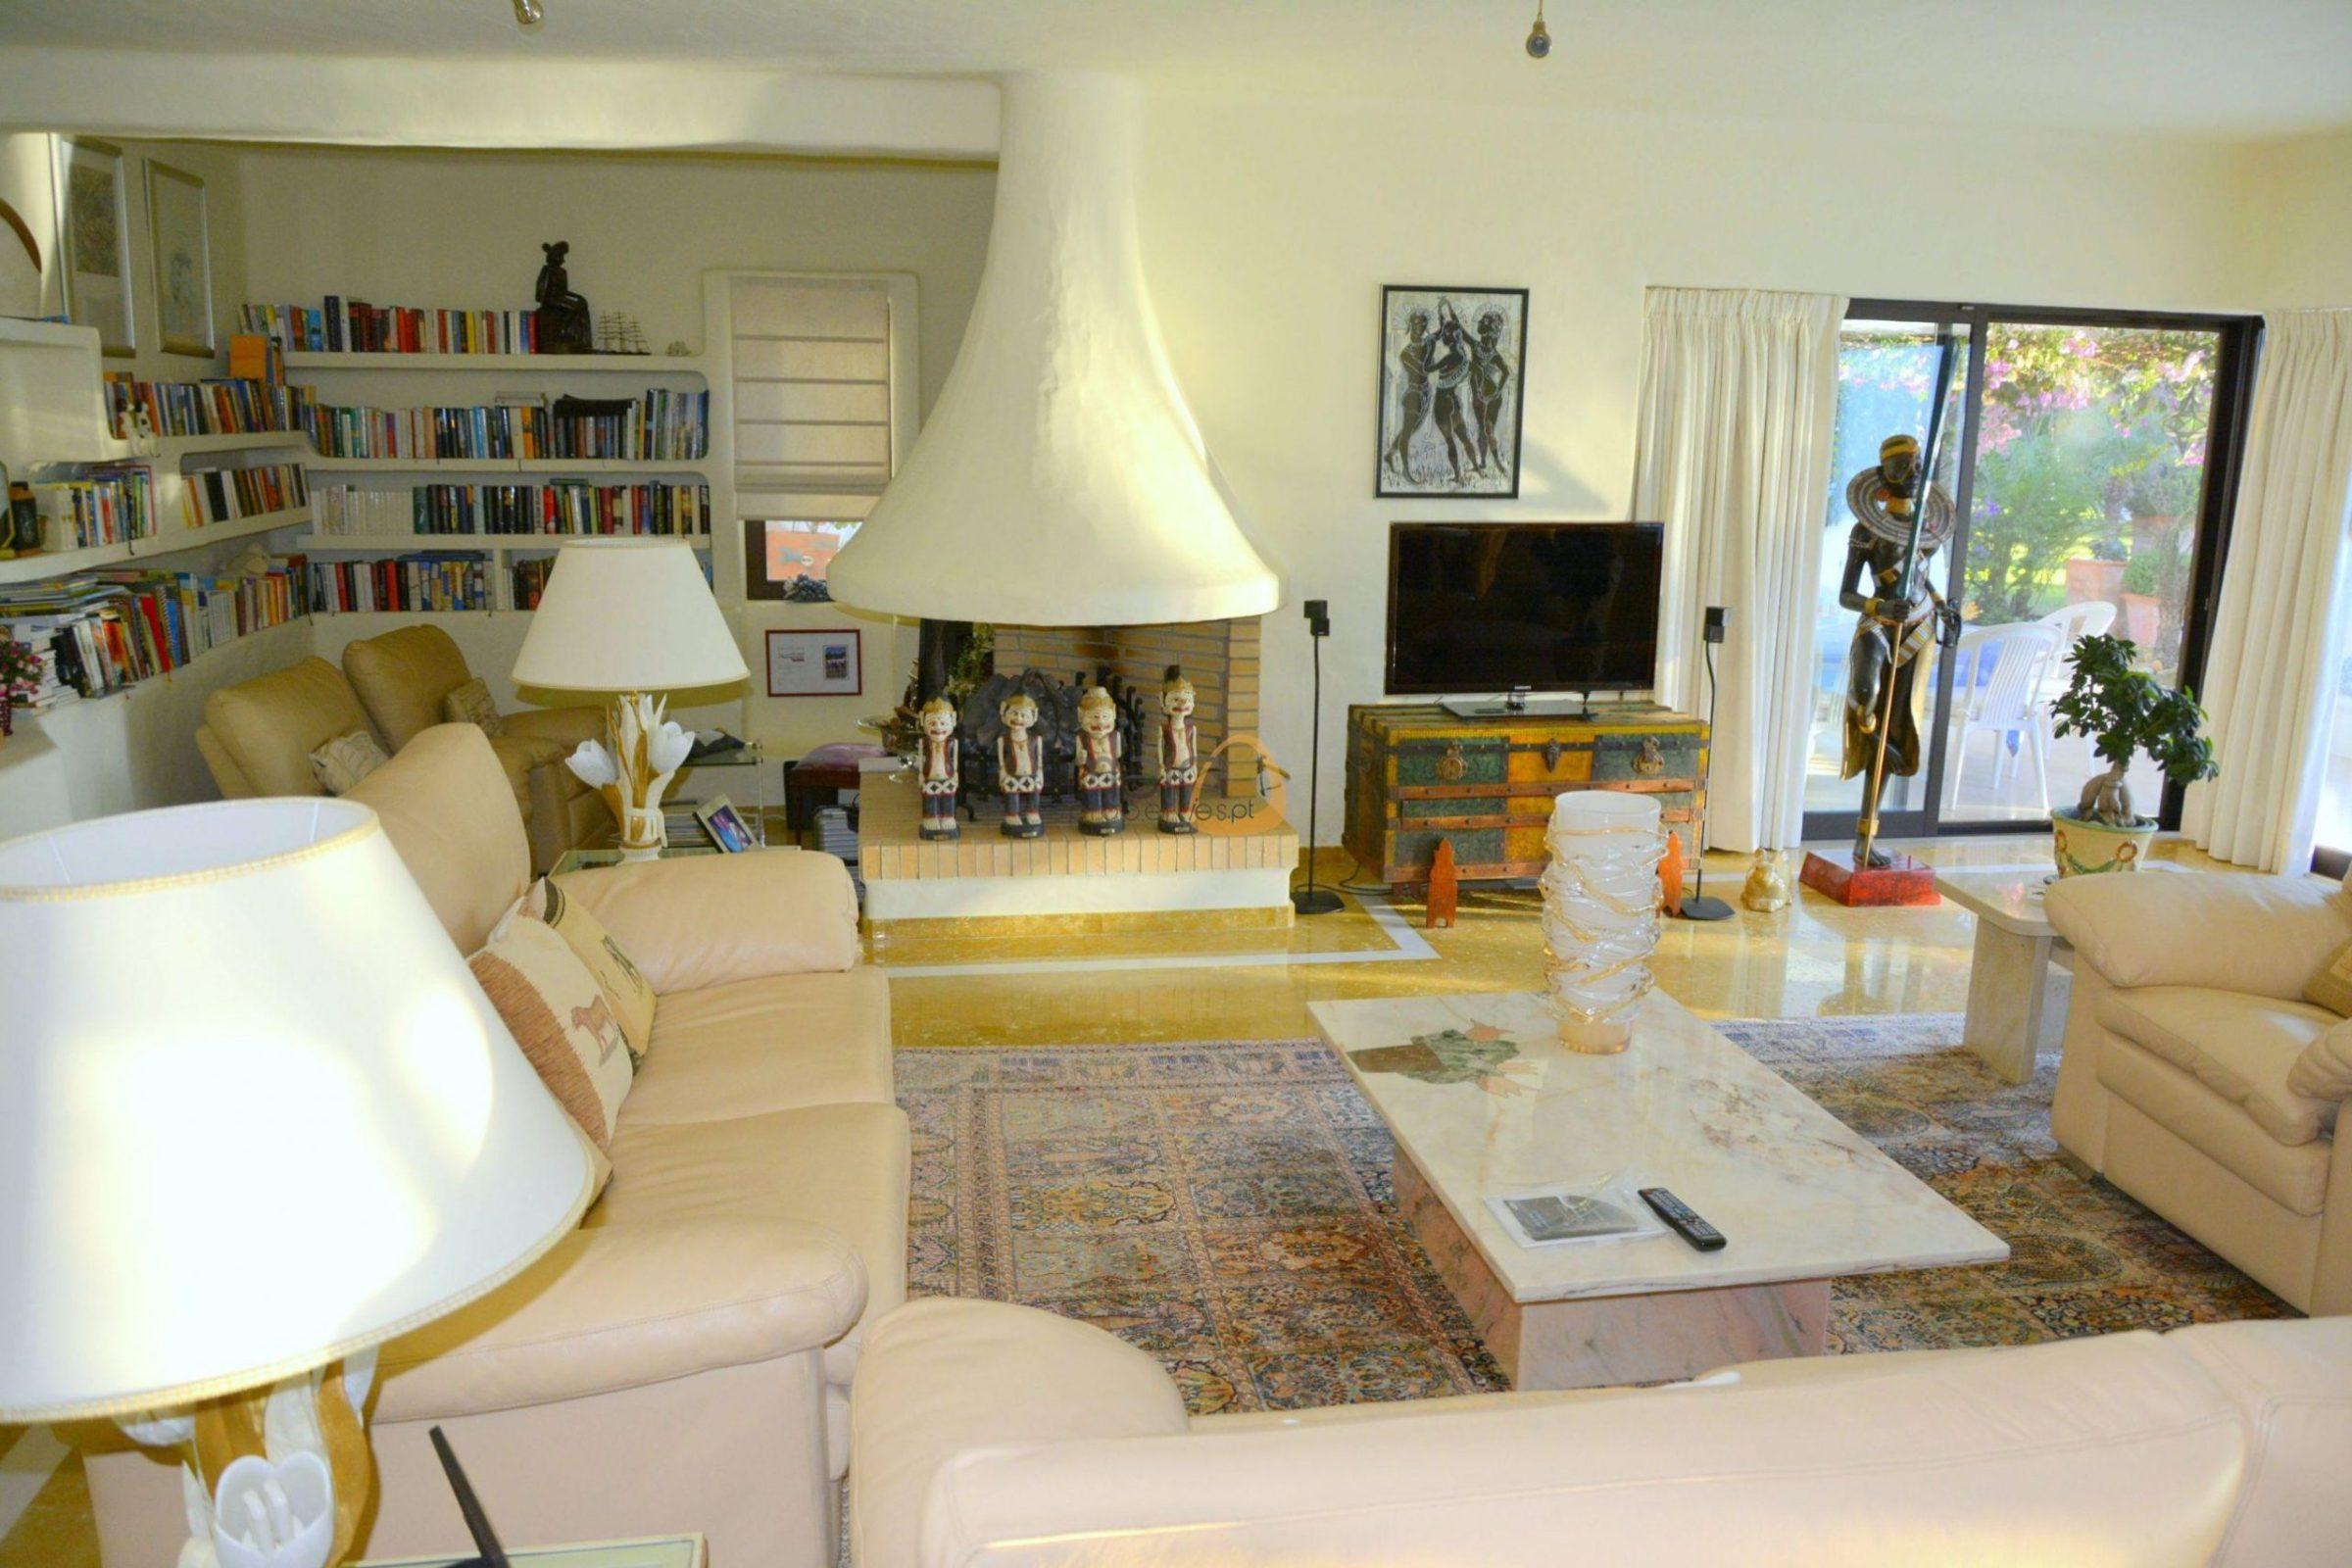 [:pt]Moradia com 5 quartos na Quinta do Lago :: Sala 1 :: MainProperties :: 020061[:en]5 bedroom villa in Quinta do Lago :: Living Room :: MainProperties :: 020061[:]